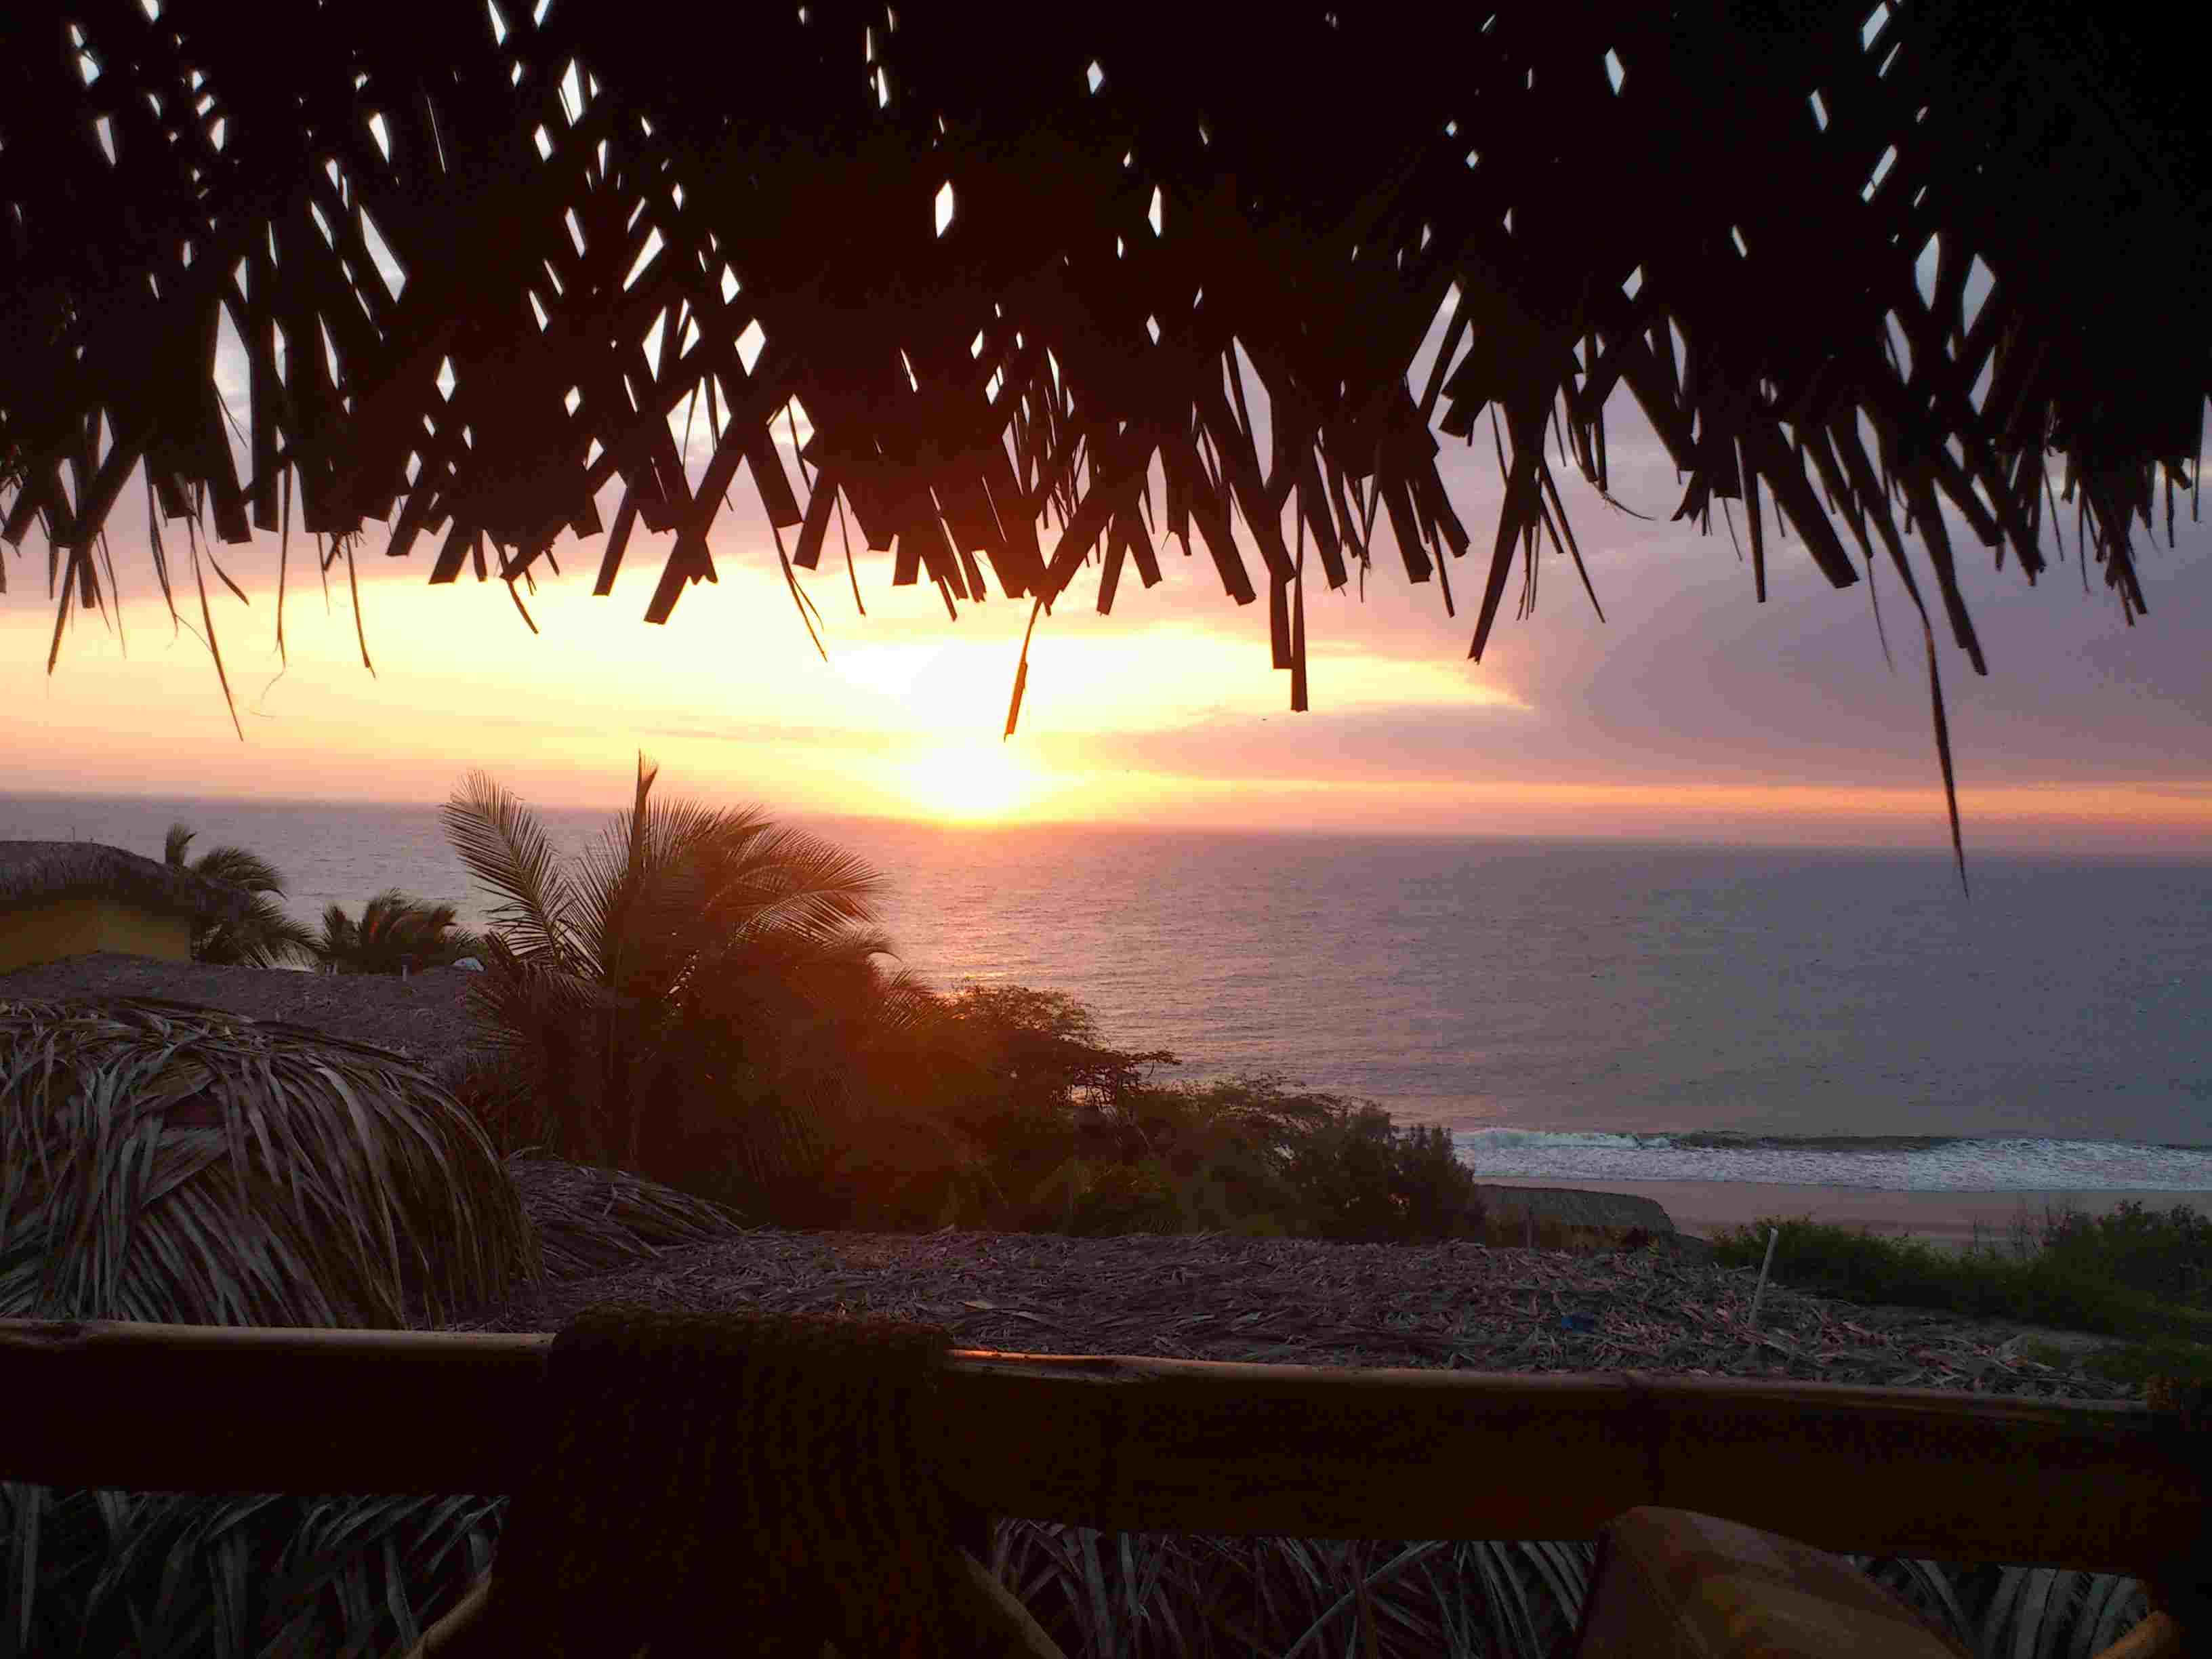 playa-vichayito-.JPG